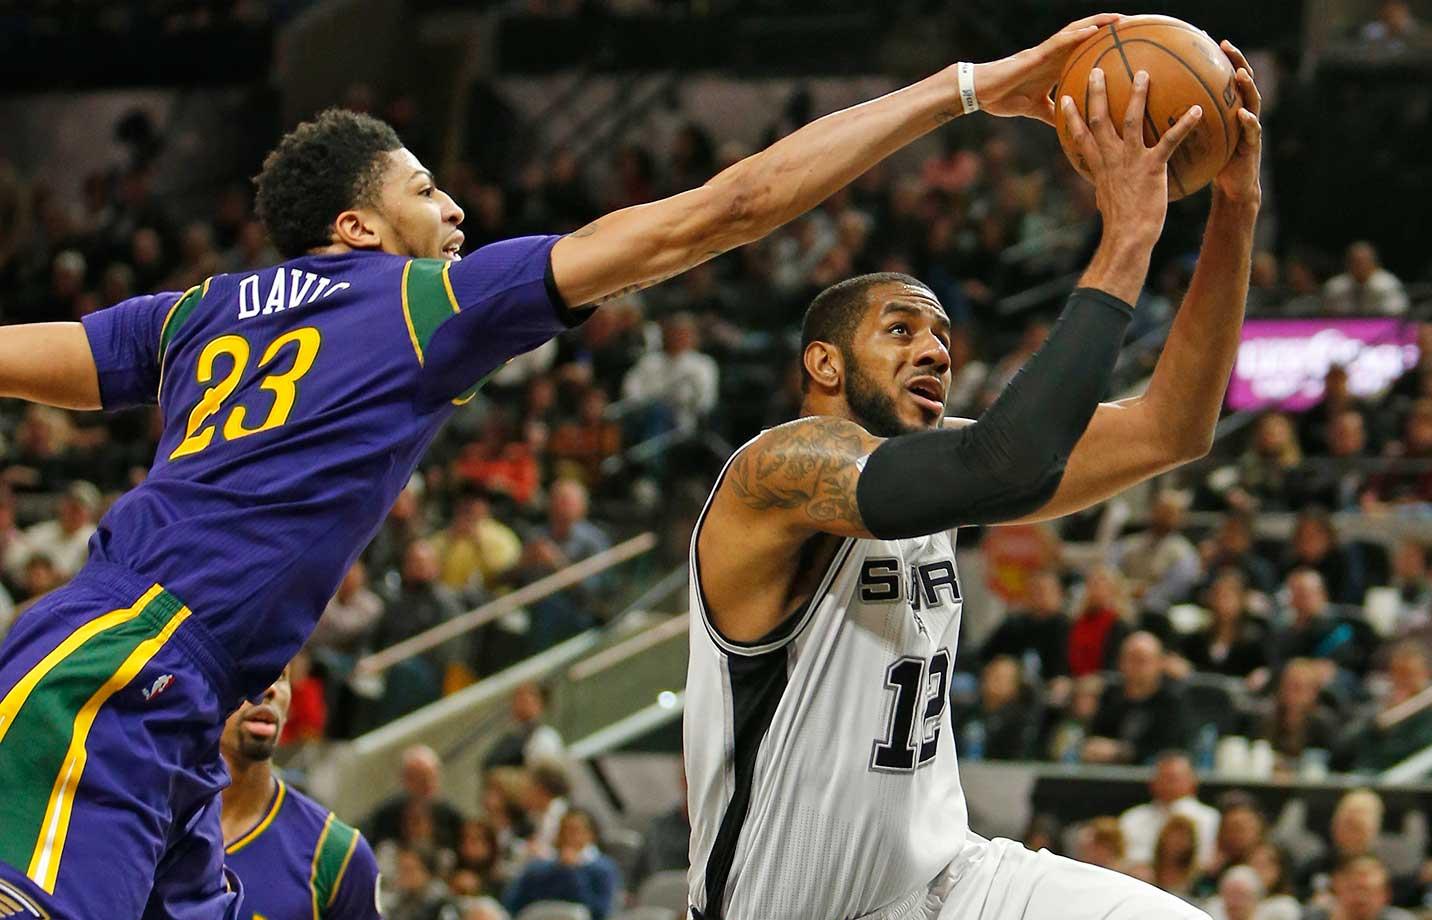 LaMarcus Aldridge of the San Antonio Spurs drives past Anthony Davis of the New Orleans Pelicans at AT&T Center in San Antonio.